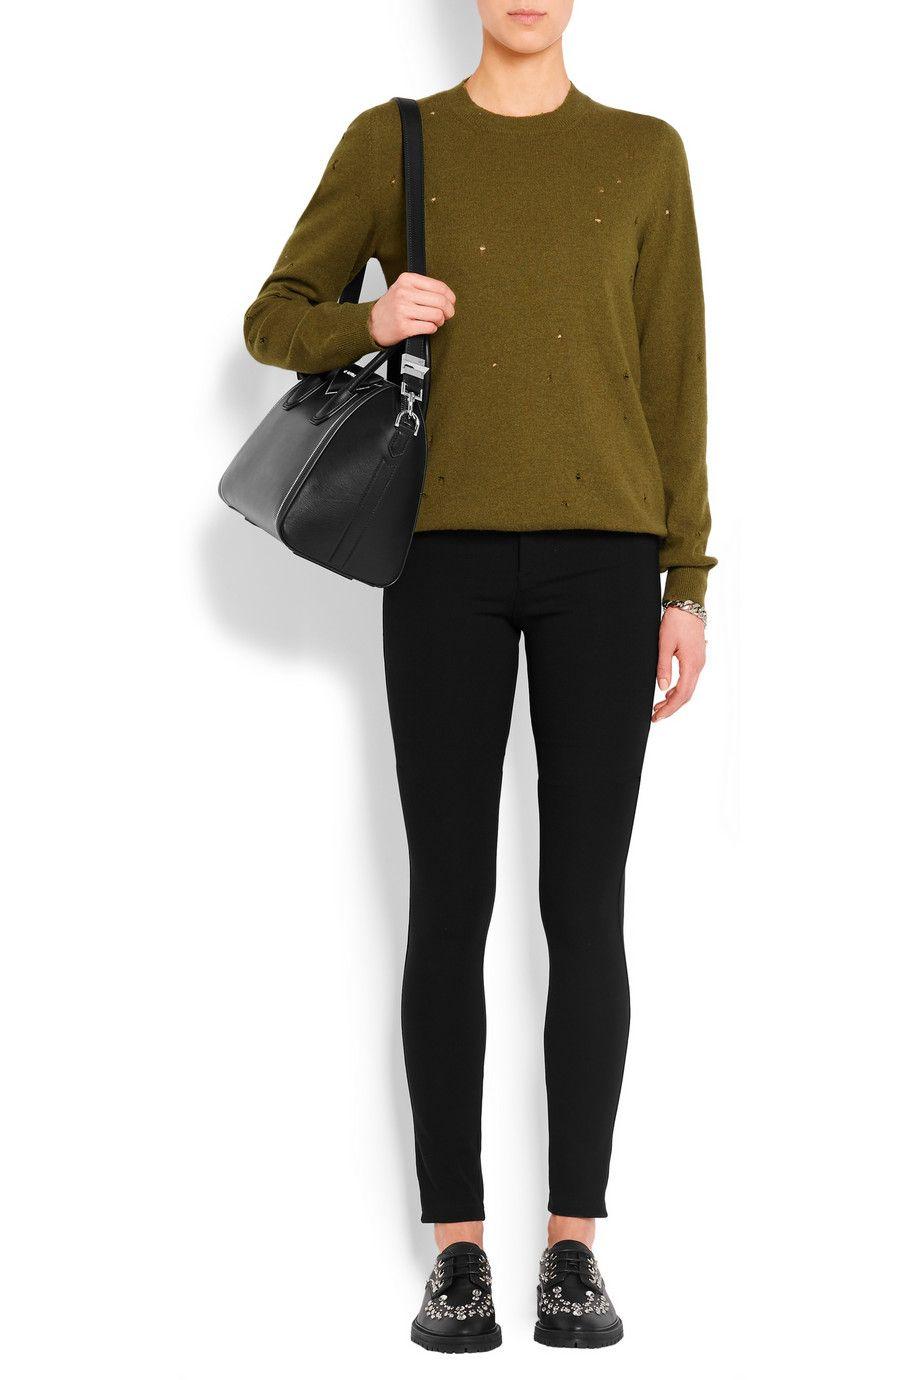 Givenchy | Sac Antigona petit modèle en cuir noir | NET-A-PORTER.COM